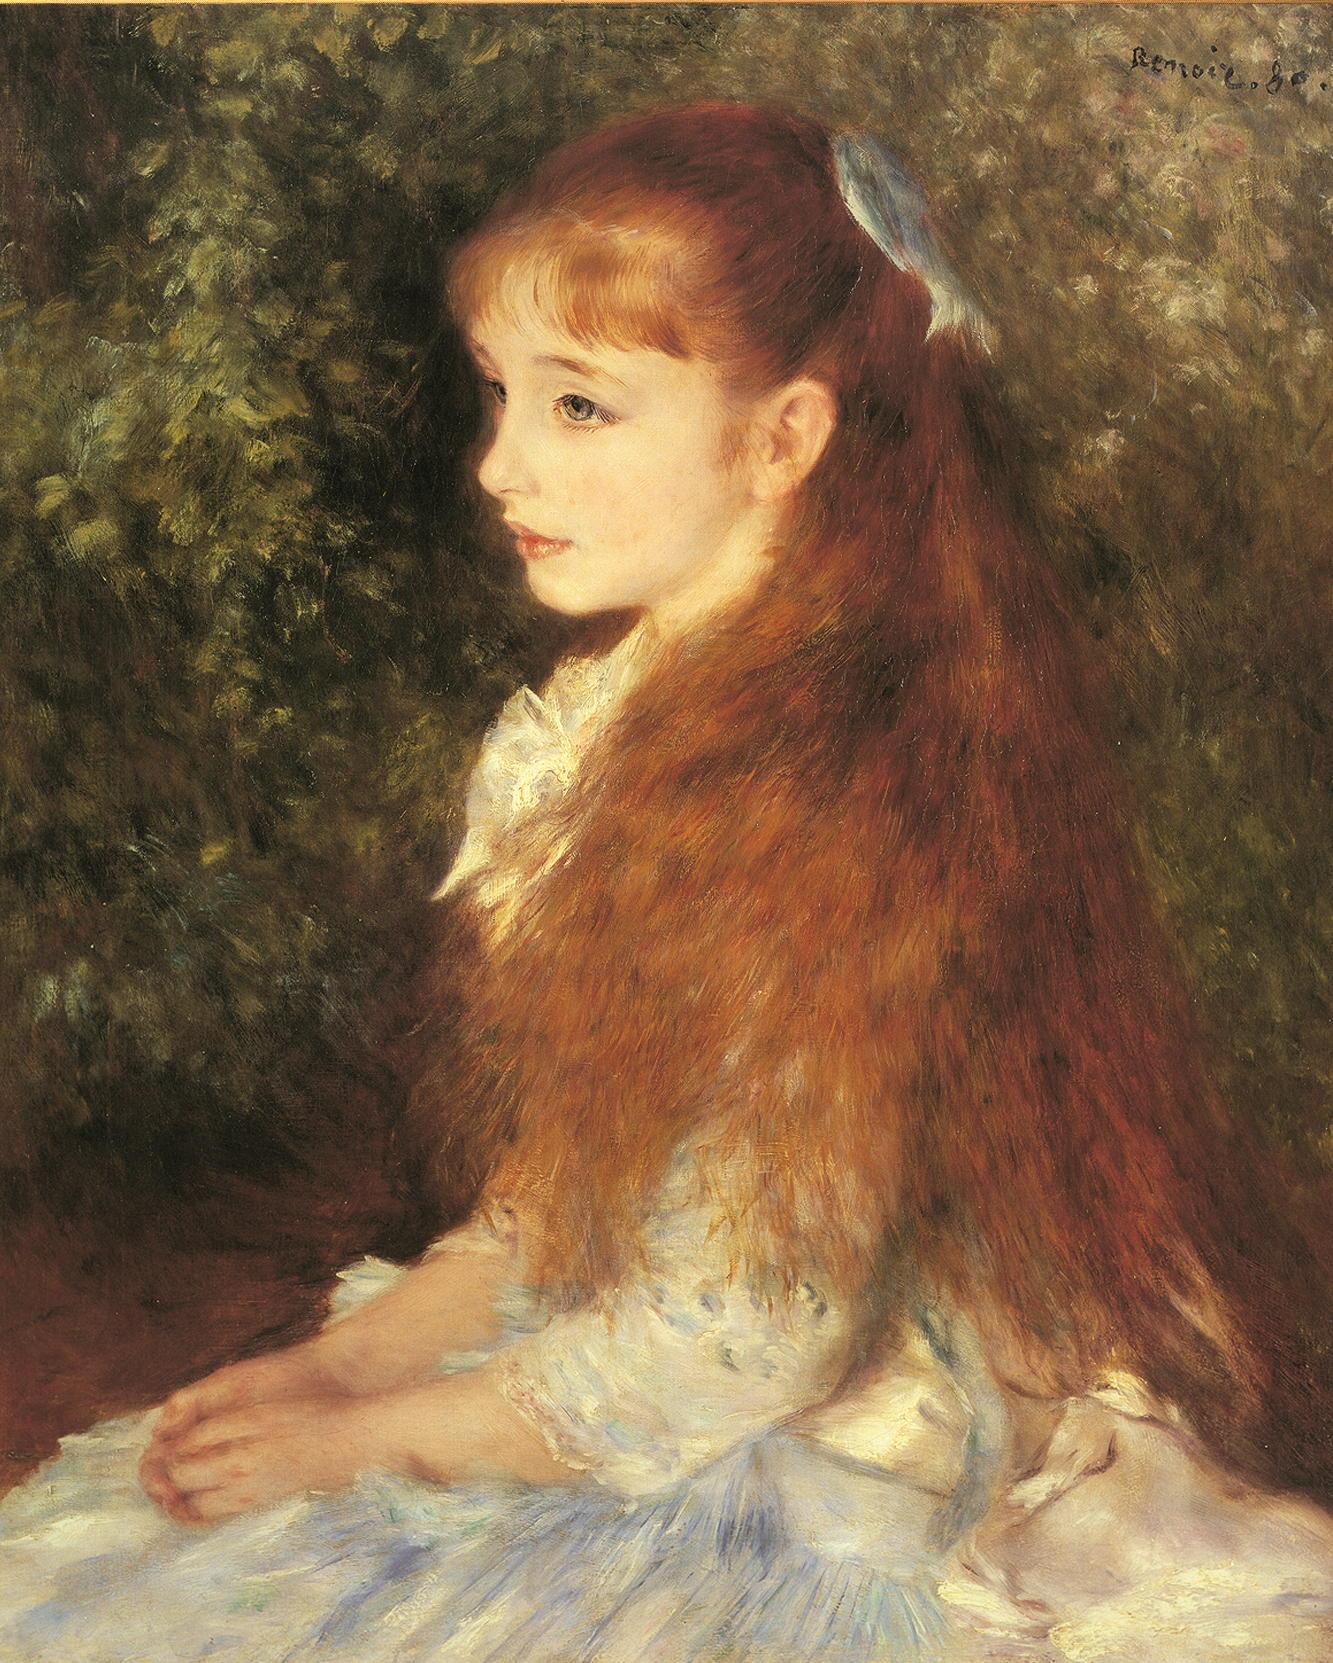 "Kunstdruck """"Mademoiselle Irene Cohen d`Anvers"" von Renoir"